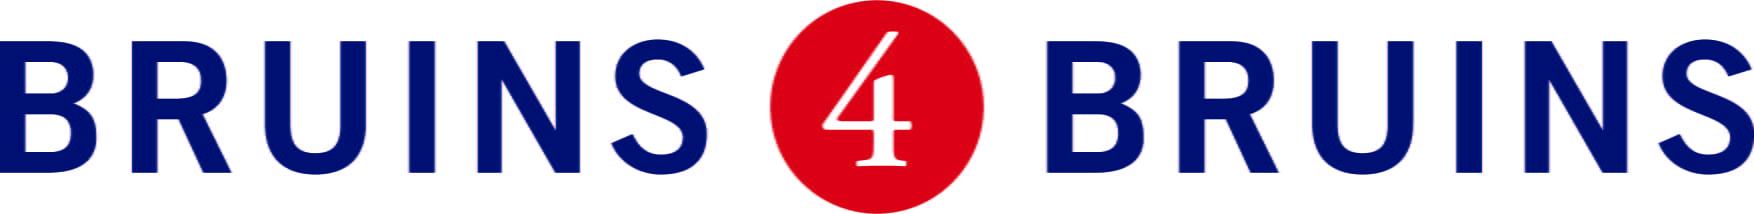 Bruins4Bruins Logo